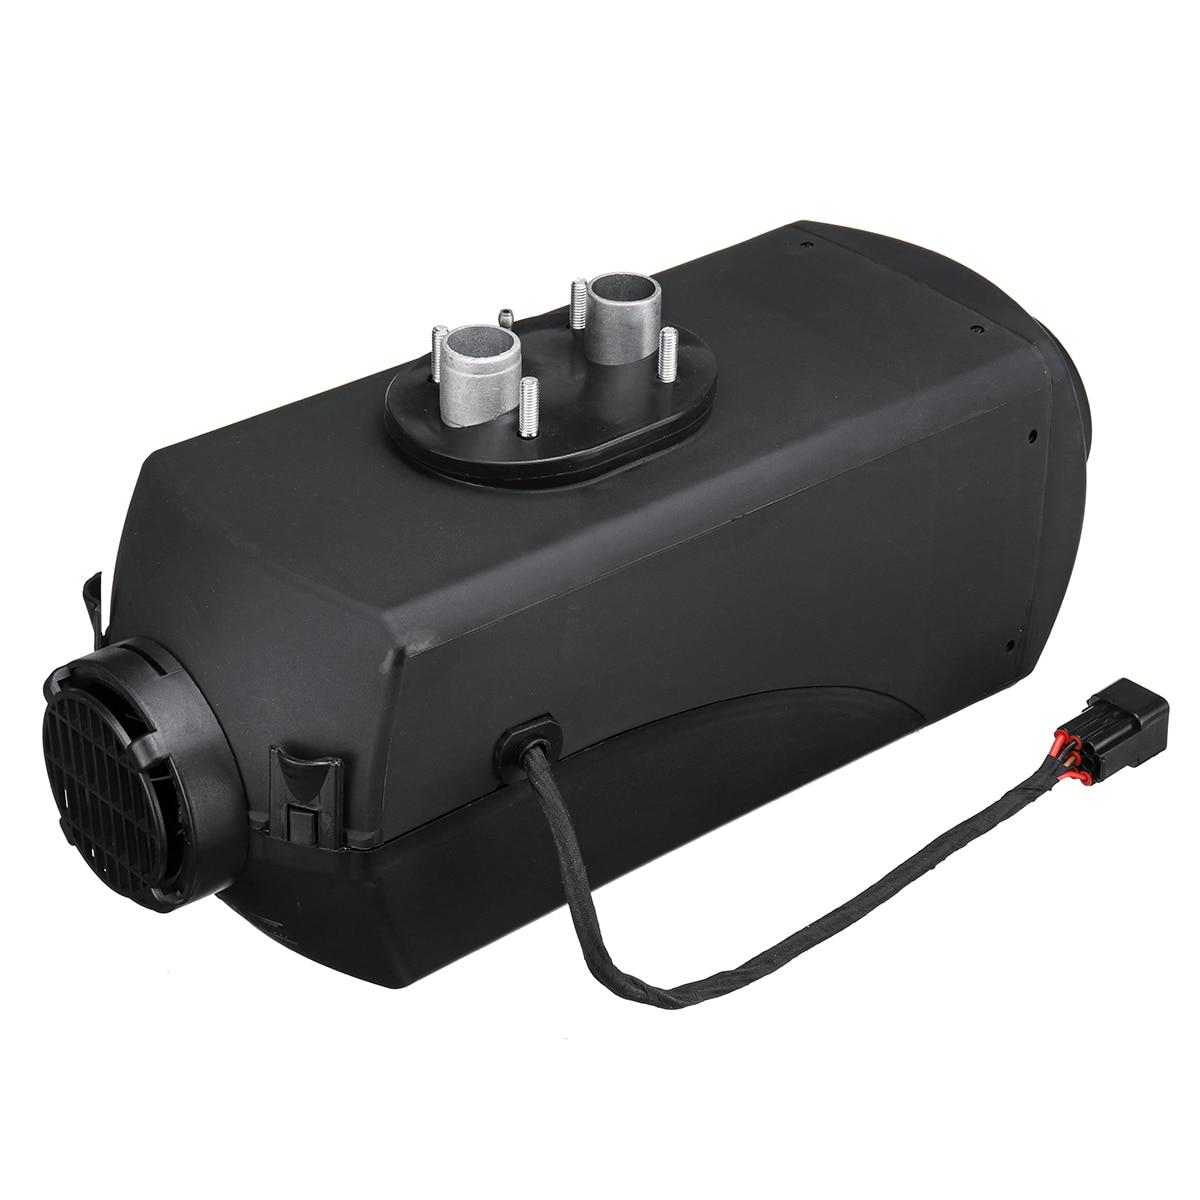 Standalone Heater Salon Analog Eberspacher D5 ManCom 1104 AirTronic 5kW 24 V